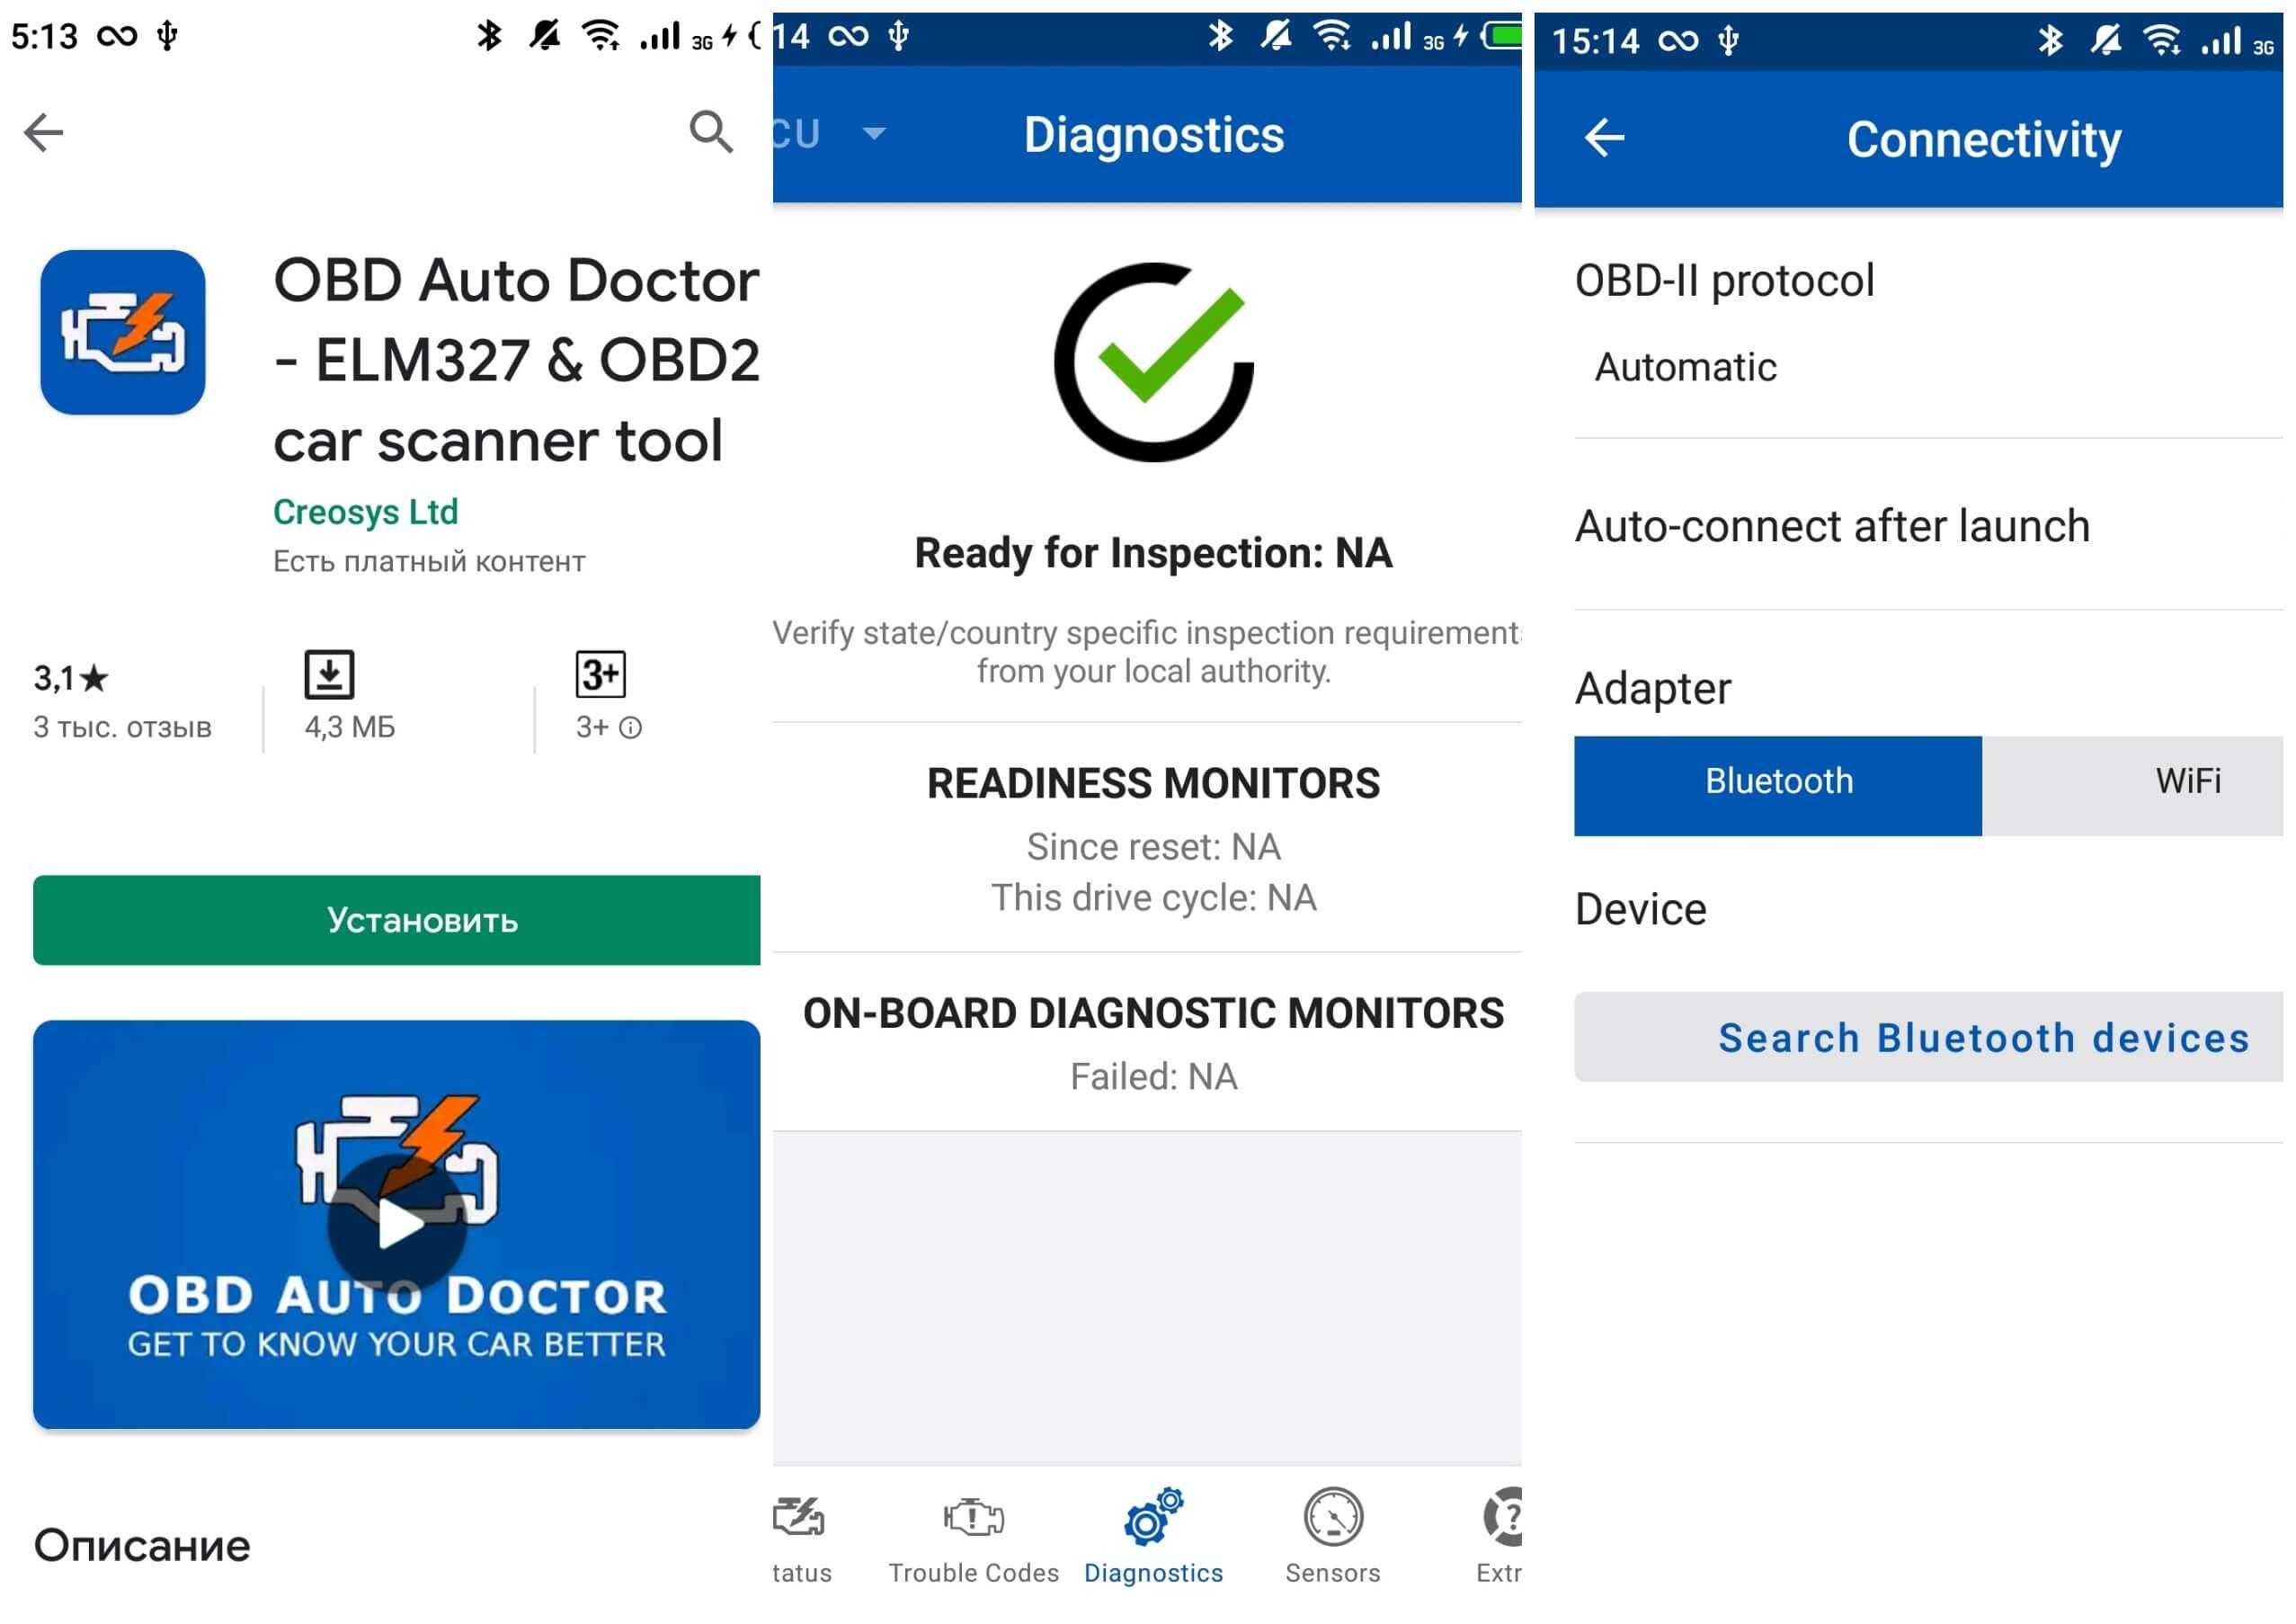 На фото изображено приложение для диагностики авто Obd авто доктор.